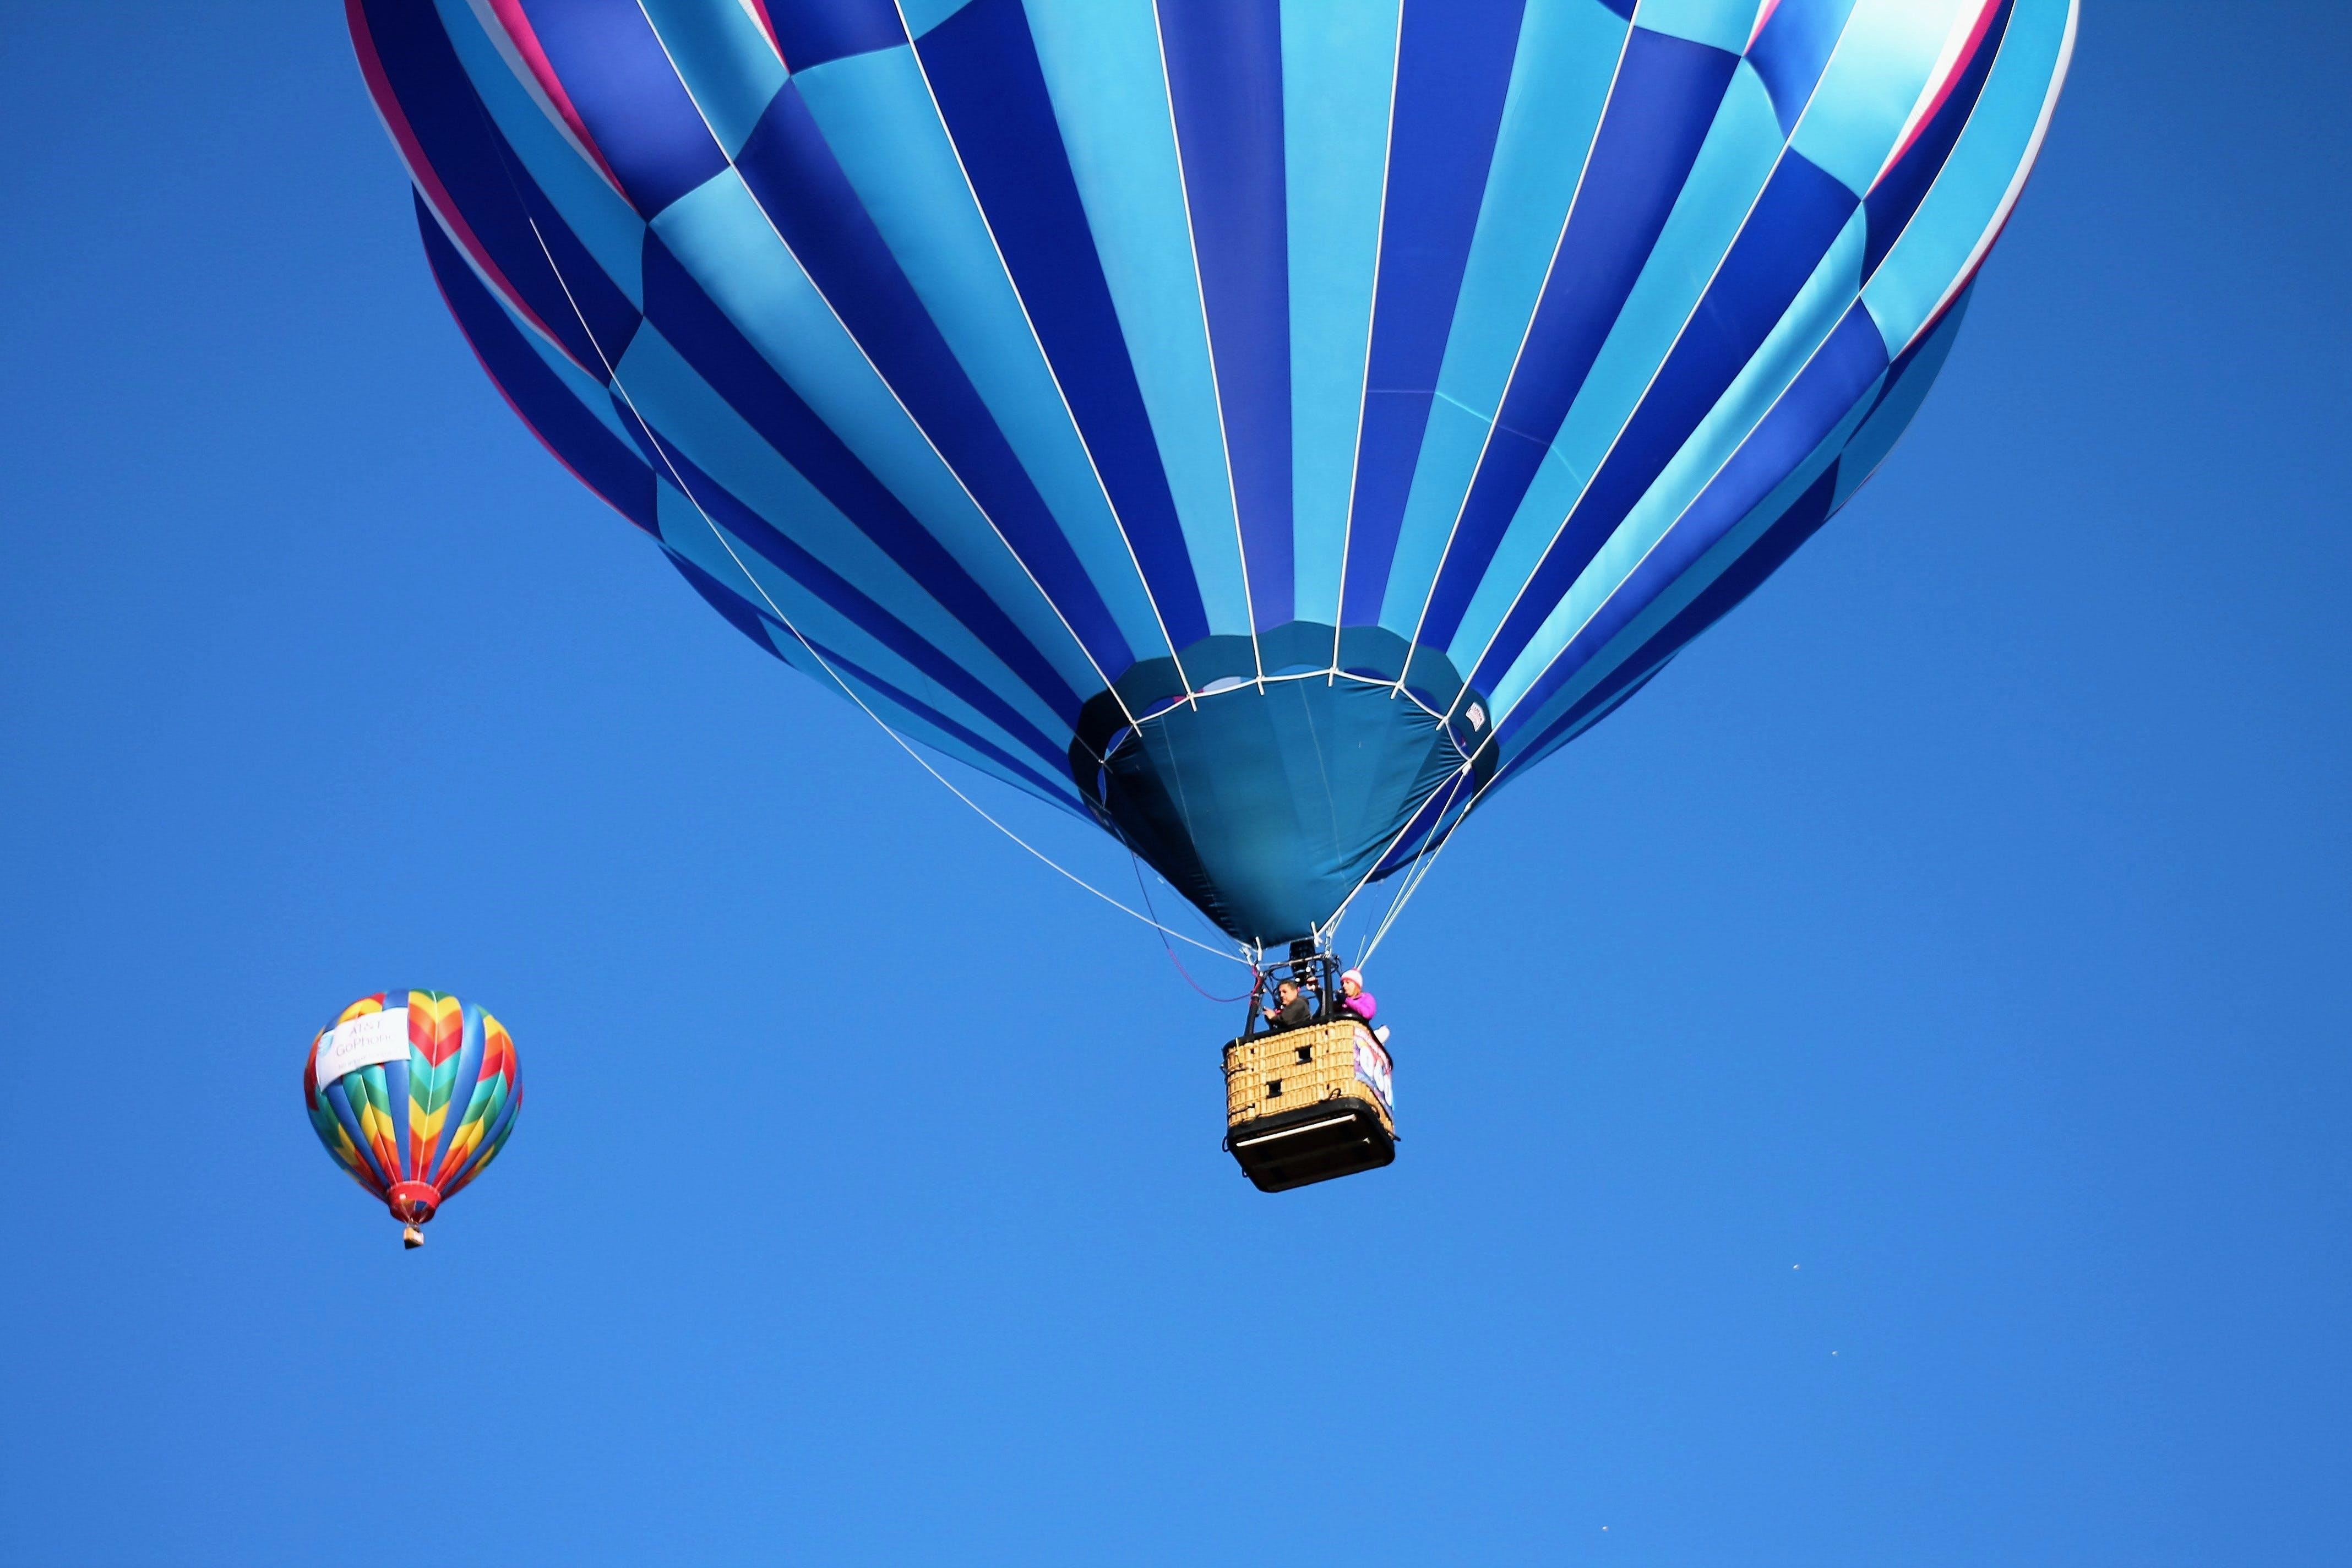 Blue and Teal Hot Air Balloon Near Pink and Blue Hot Air Balloon